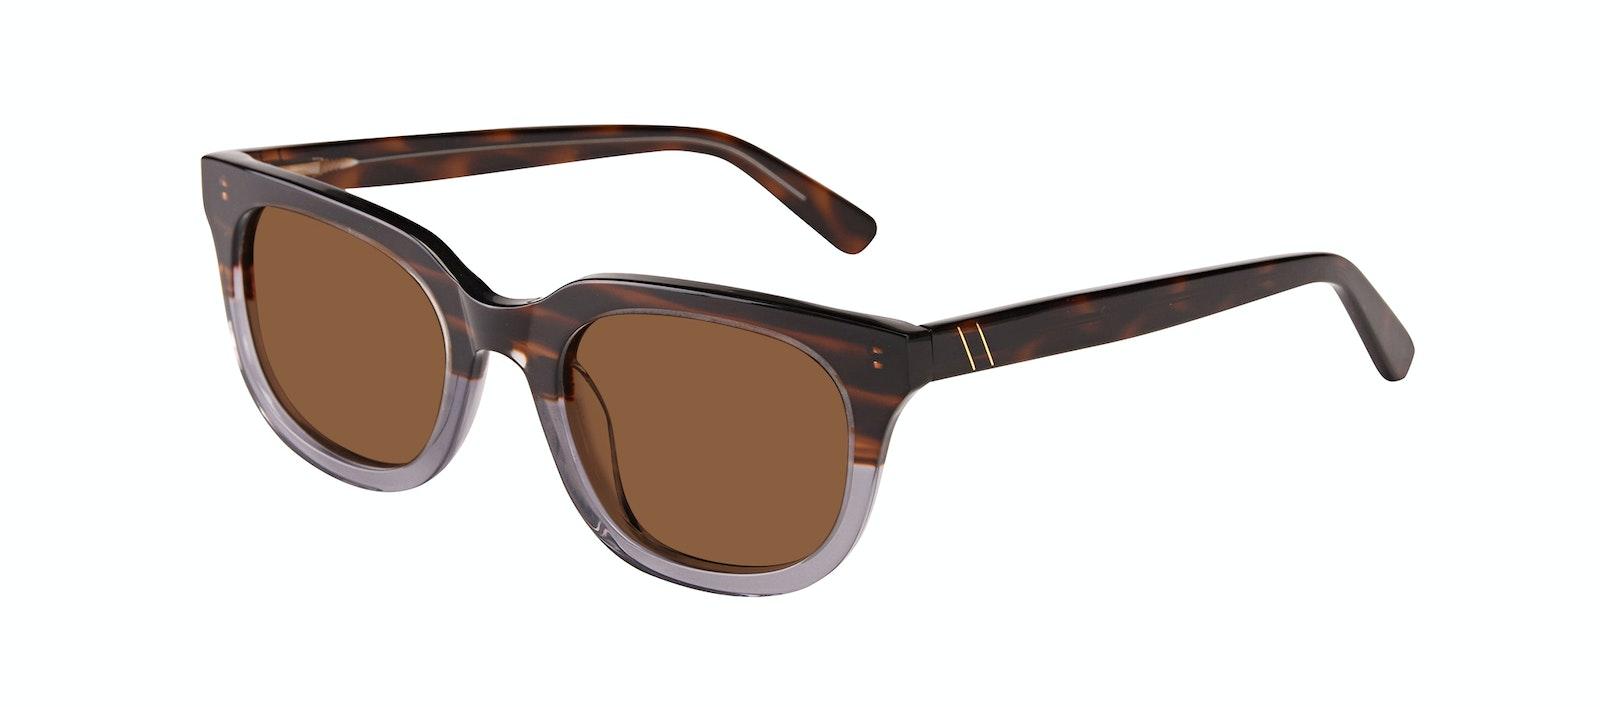 Affordable Fashion Glasses Square Sunglasses Men Stout Storm Tilt